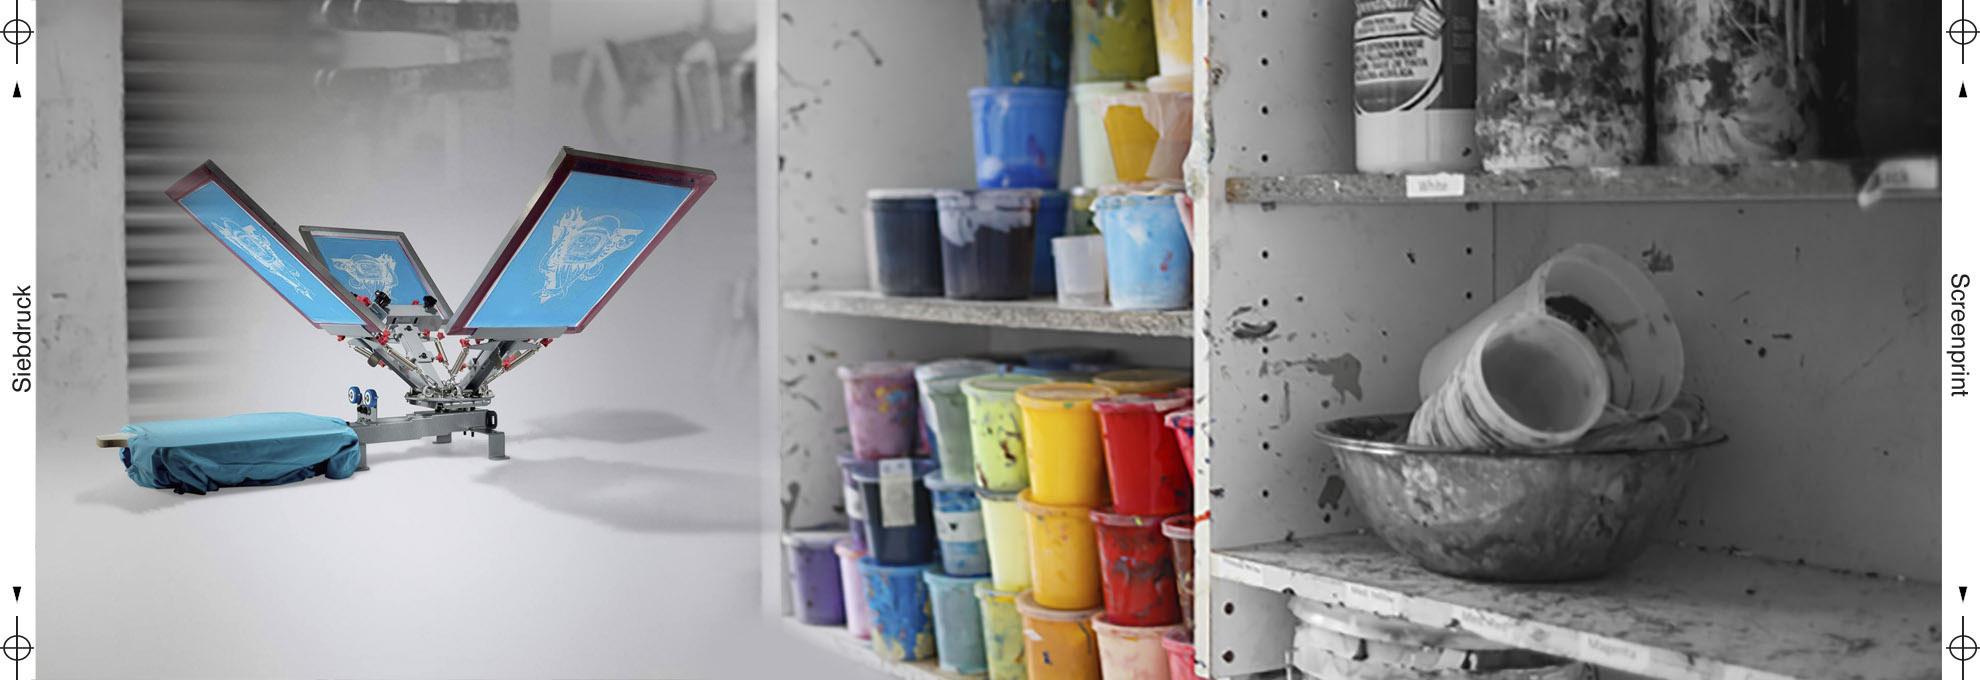 Siebdruck, Workshop, Grafik, design, print, Textildruck, grafik design, Mediengestalter, gestalten, drucken